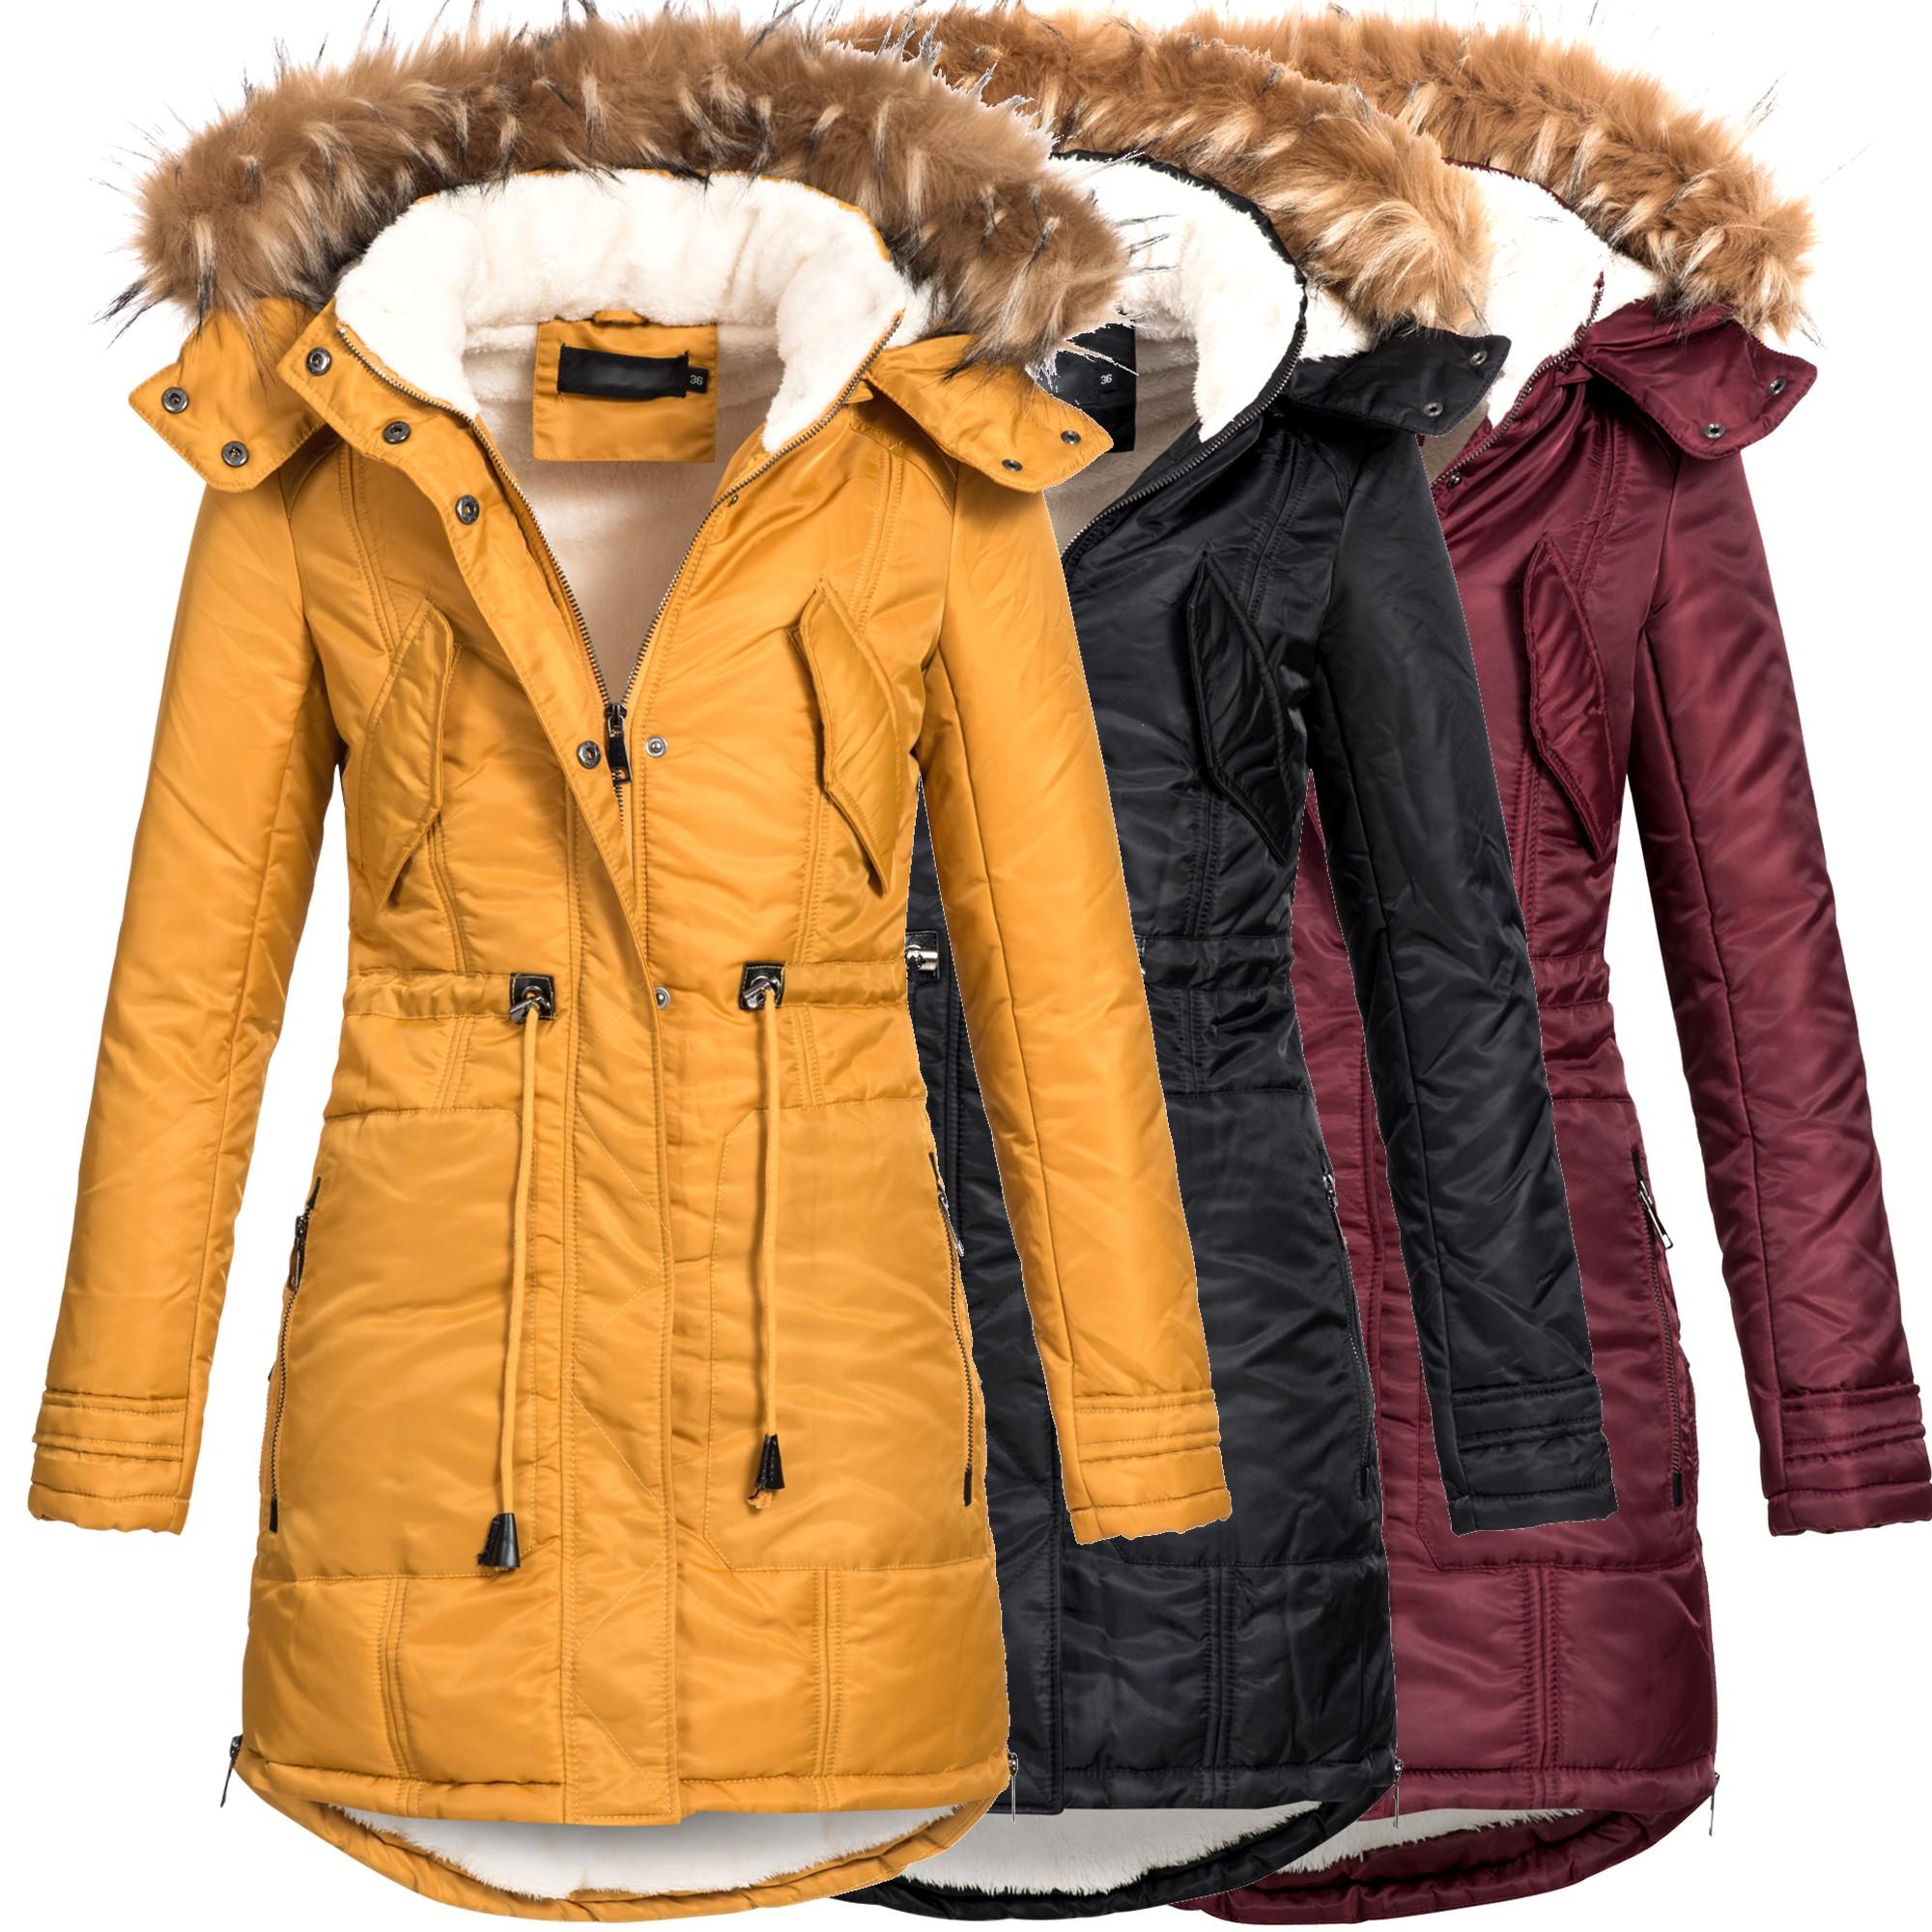 e87619dabf136b OS-Fashion Damen Mantel Jacke Winterjacke Parka warm gefüttert 16001 ...